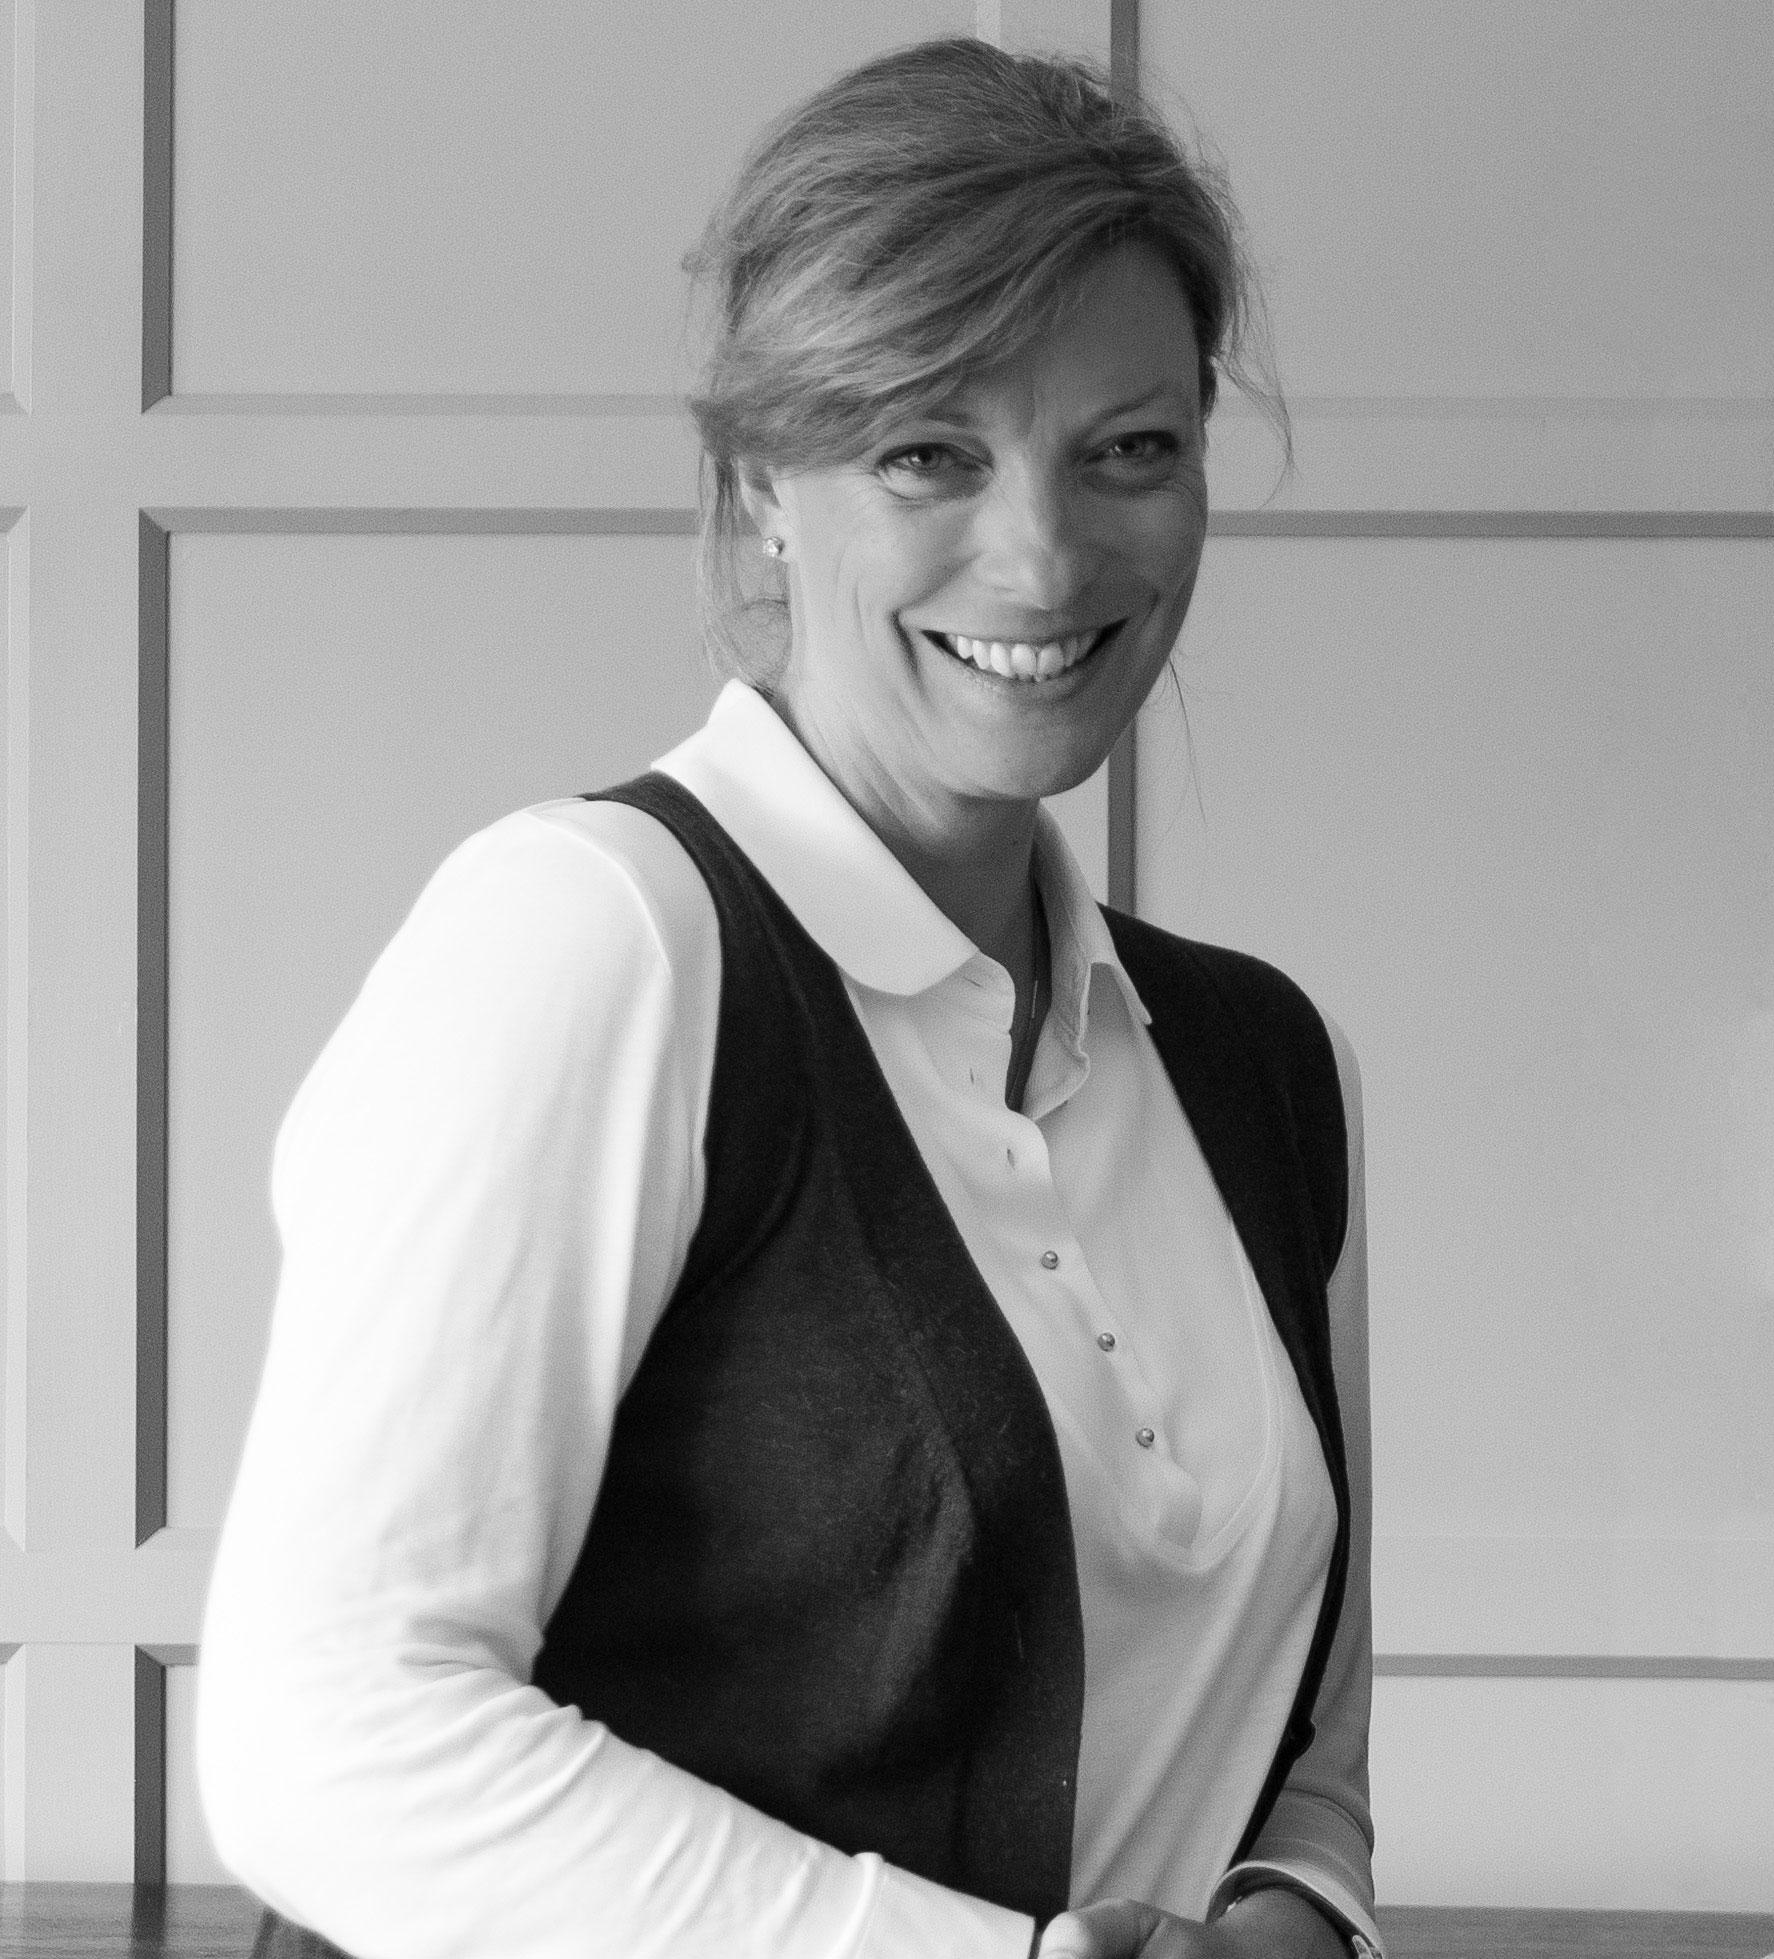 Inchbald School of Interior Design graduate and RHS Chelsea flower show gold medalist